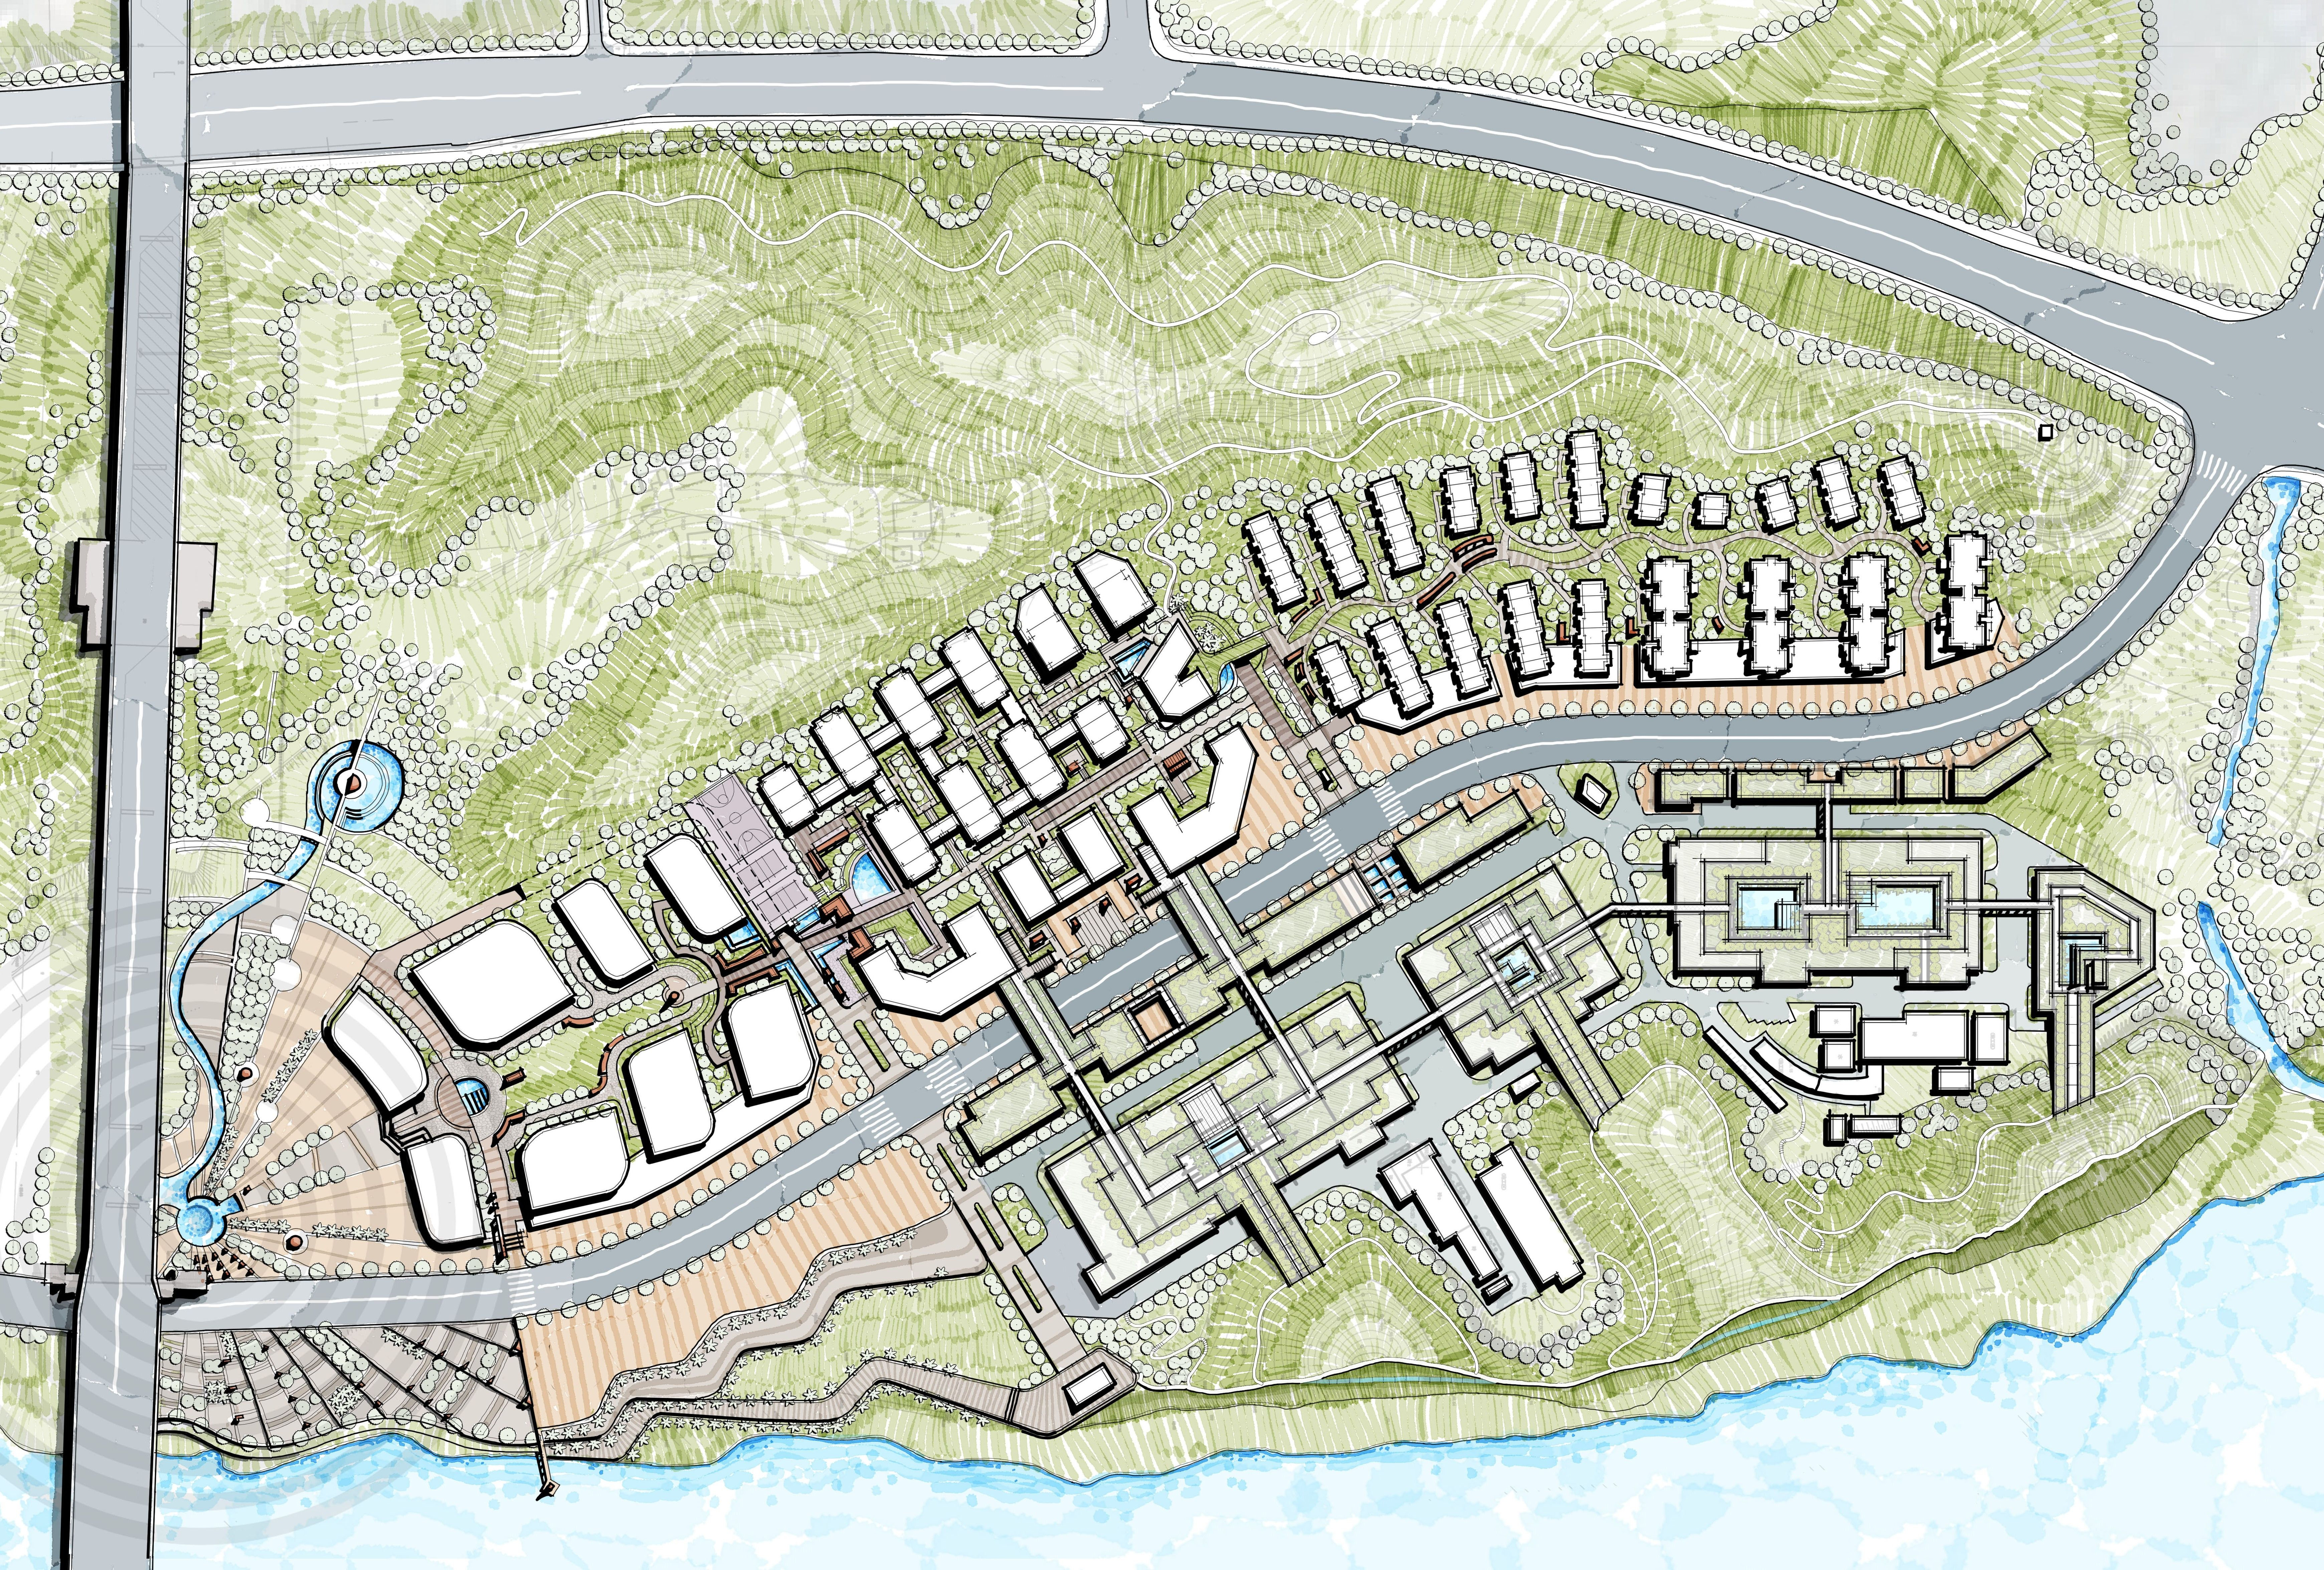 Landscape Master Plan School Mix Use Development Industrial Area Redevelopment Master Plan Public Space School